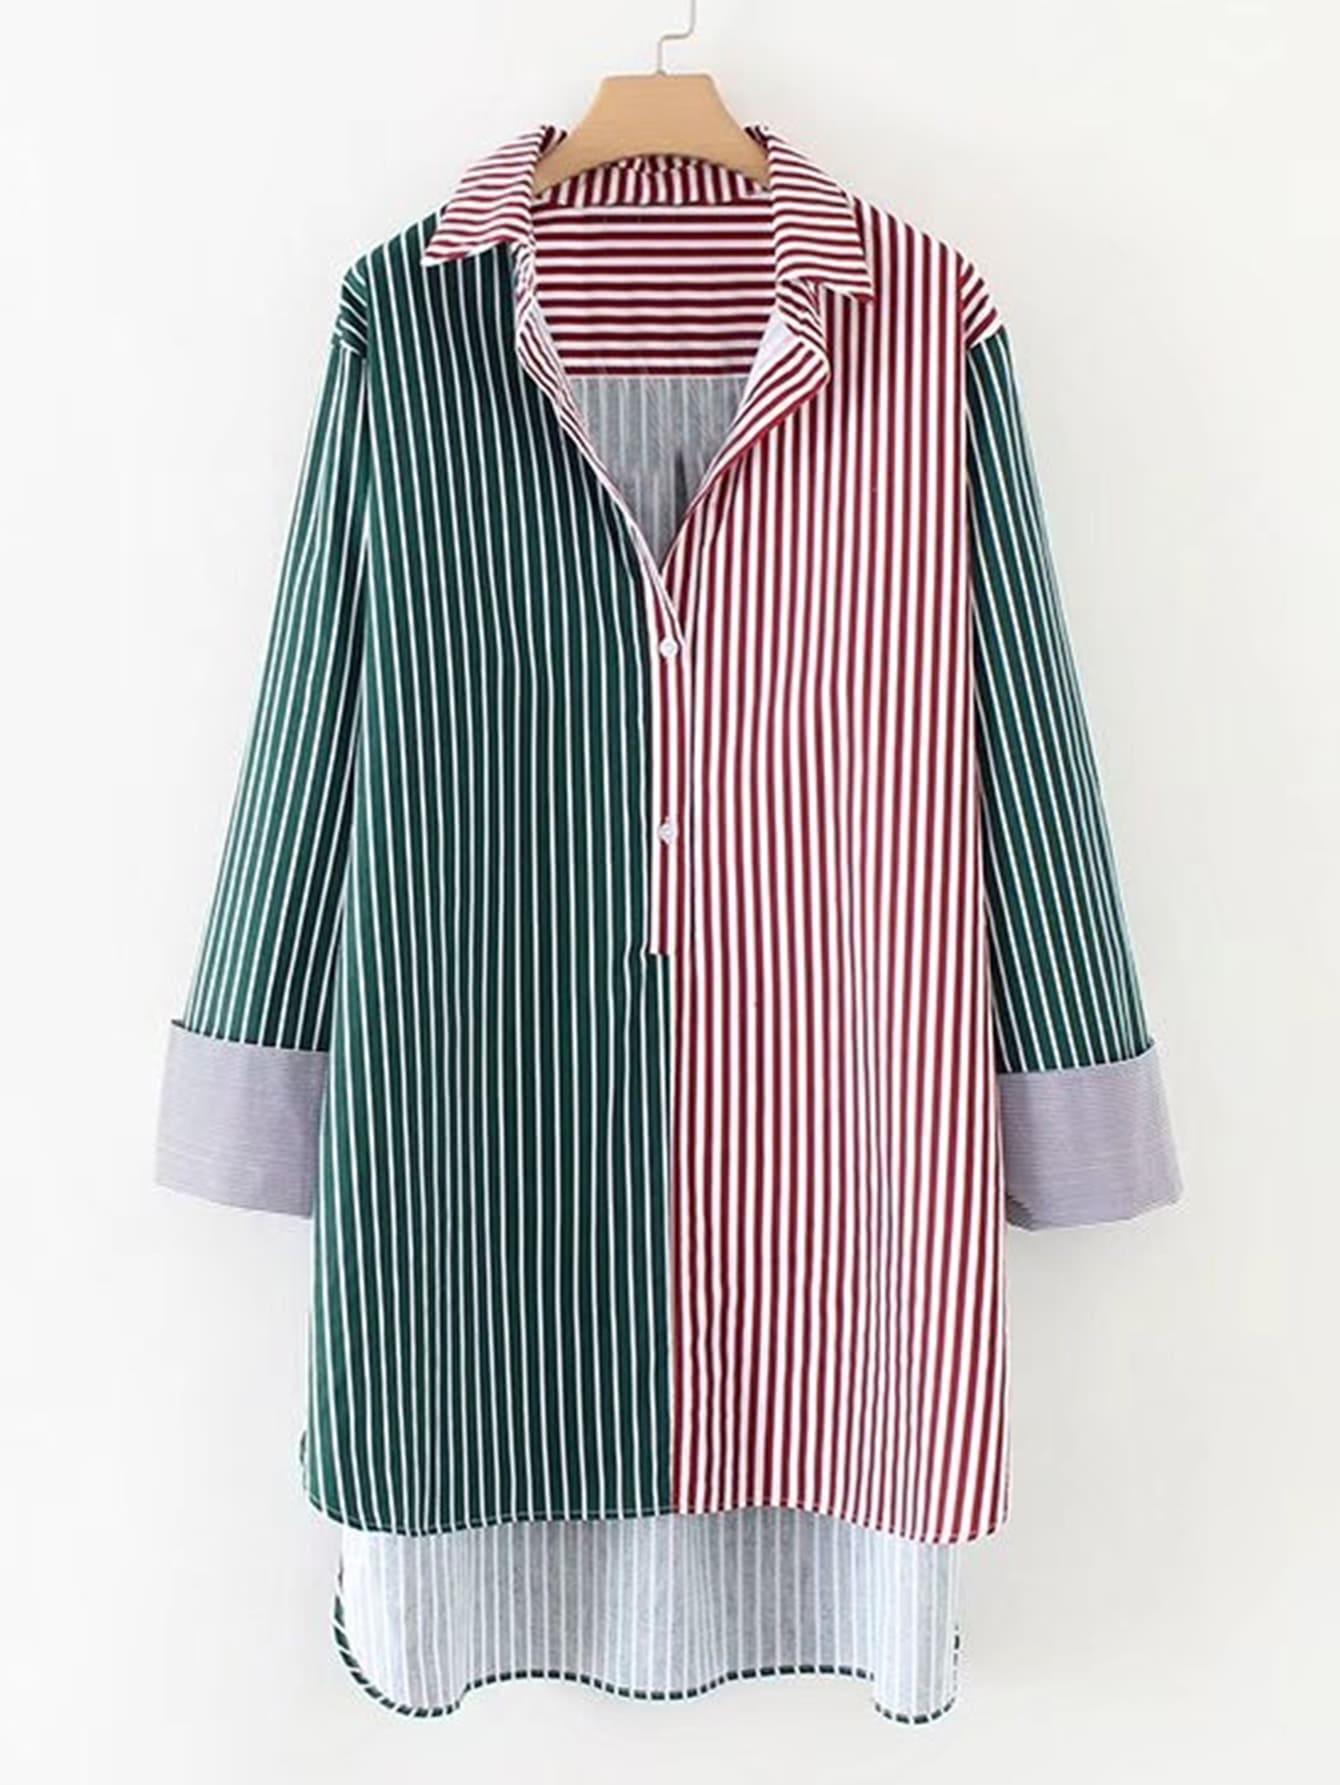 2 In 1 Dip Hem Striped Longline Blouse